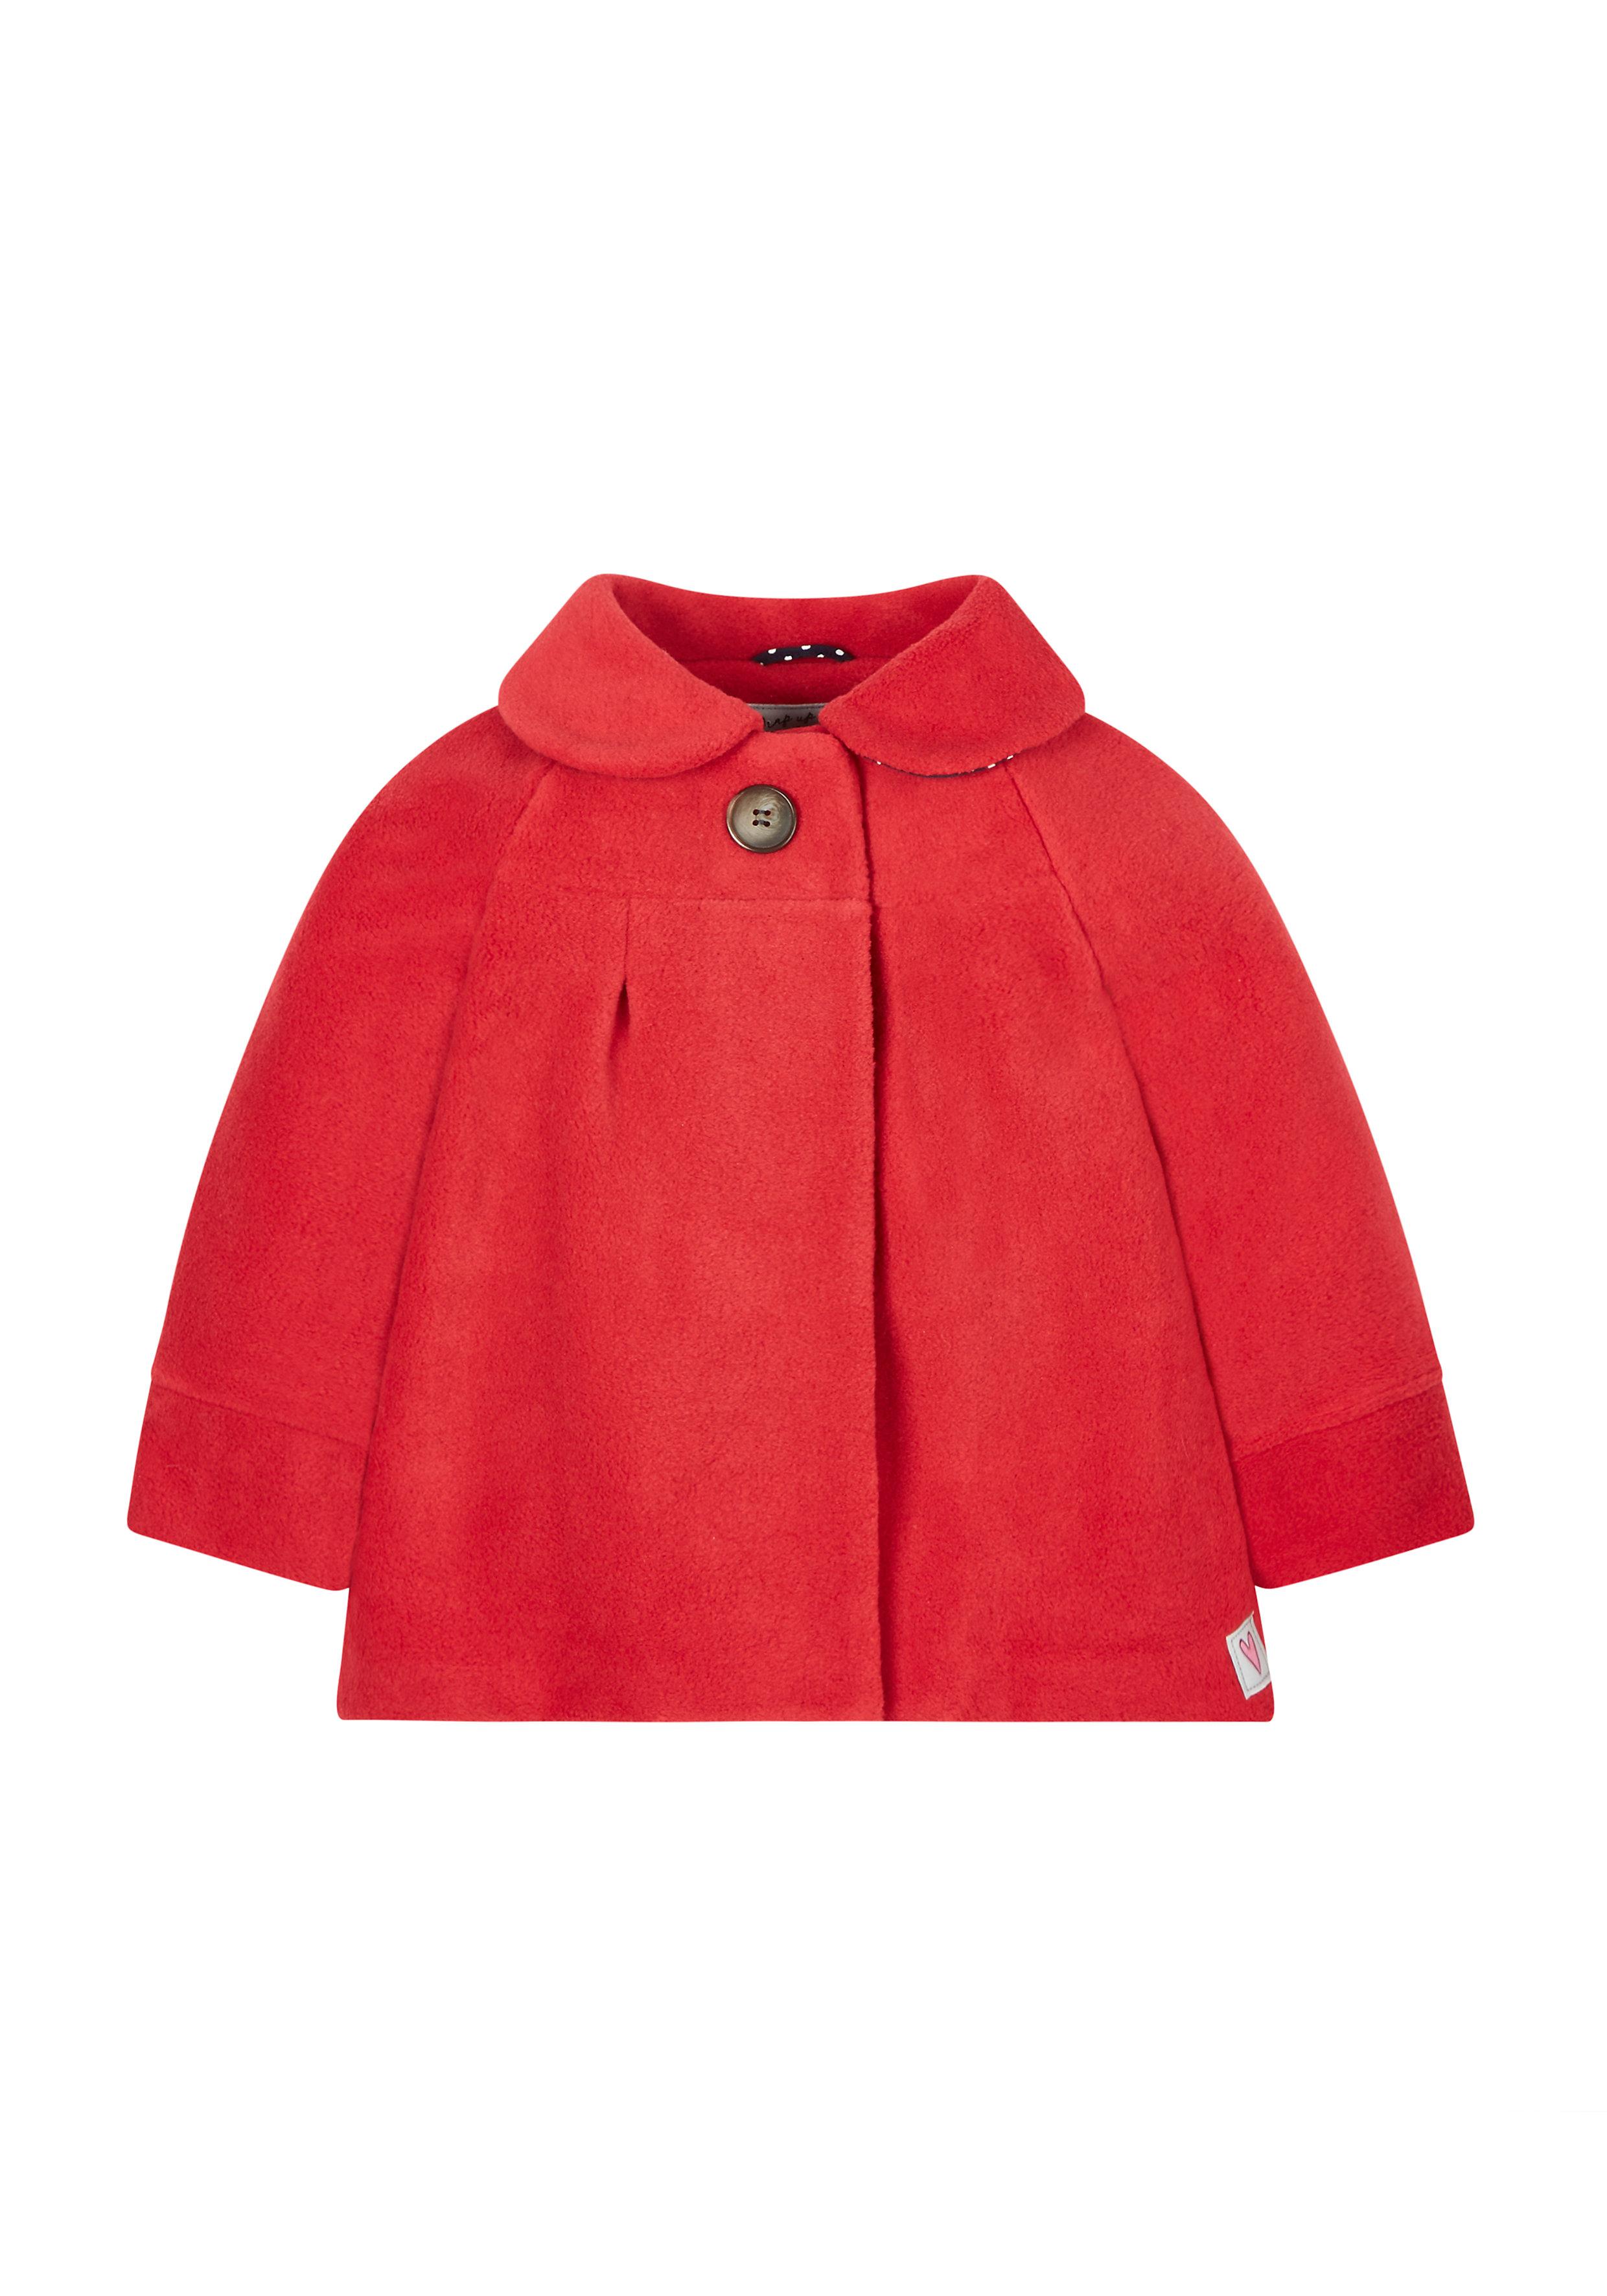 Mothercare | Girls Full Sleeves Coat - Red